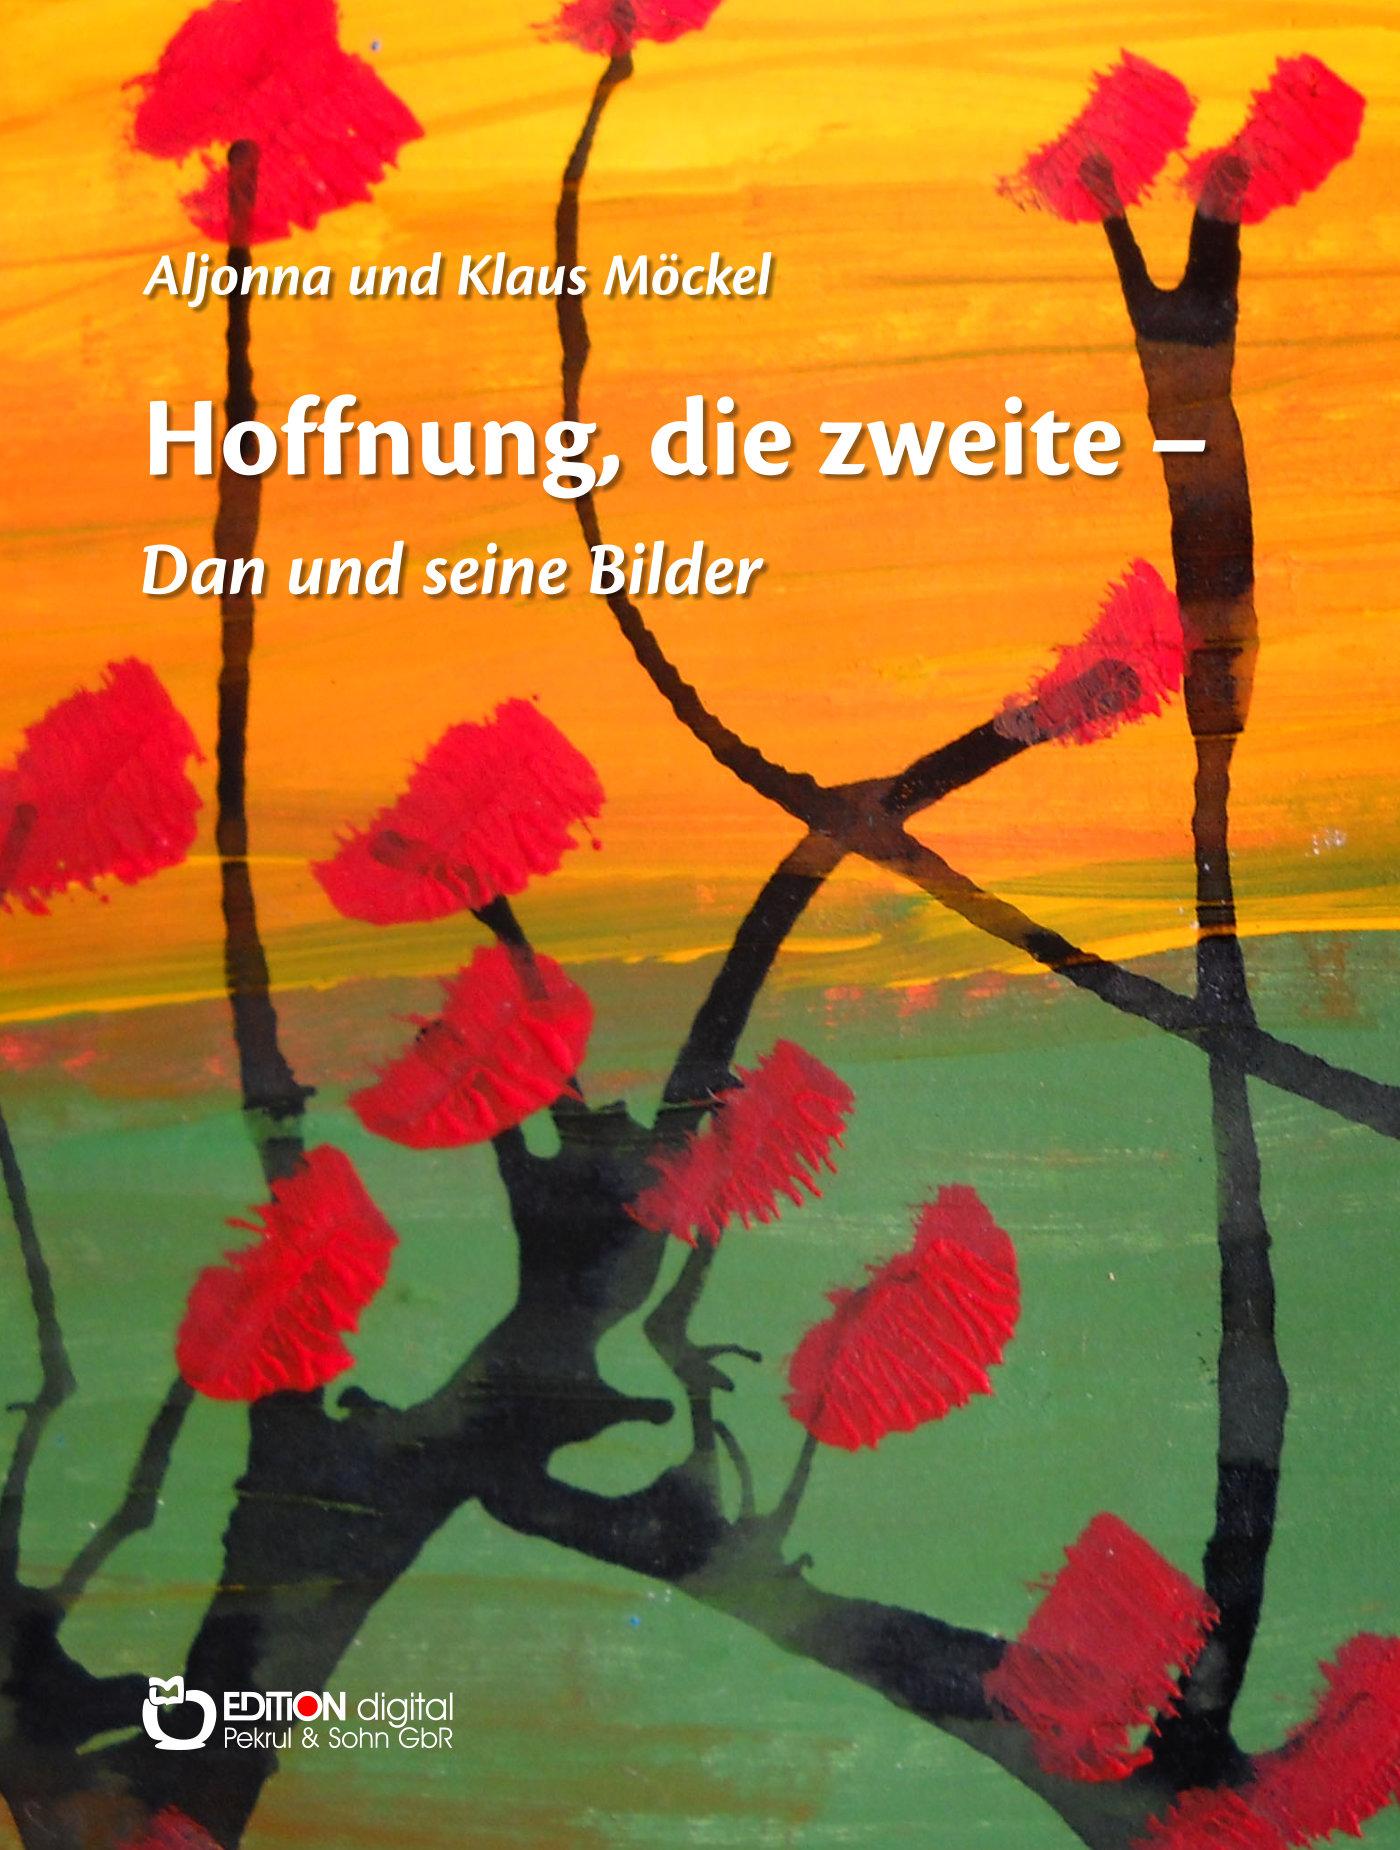 2016-09-29 Moeckel20160929